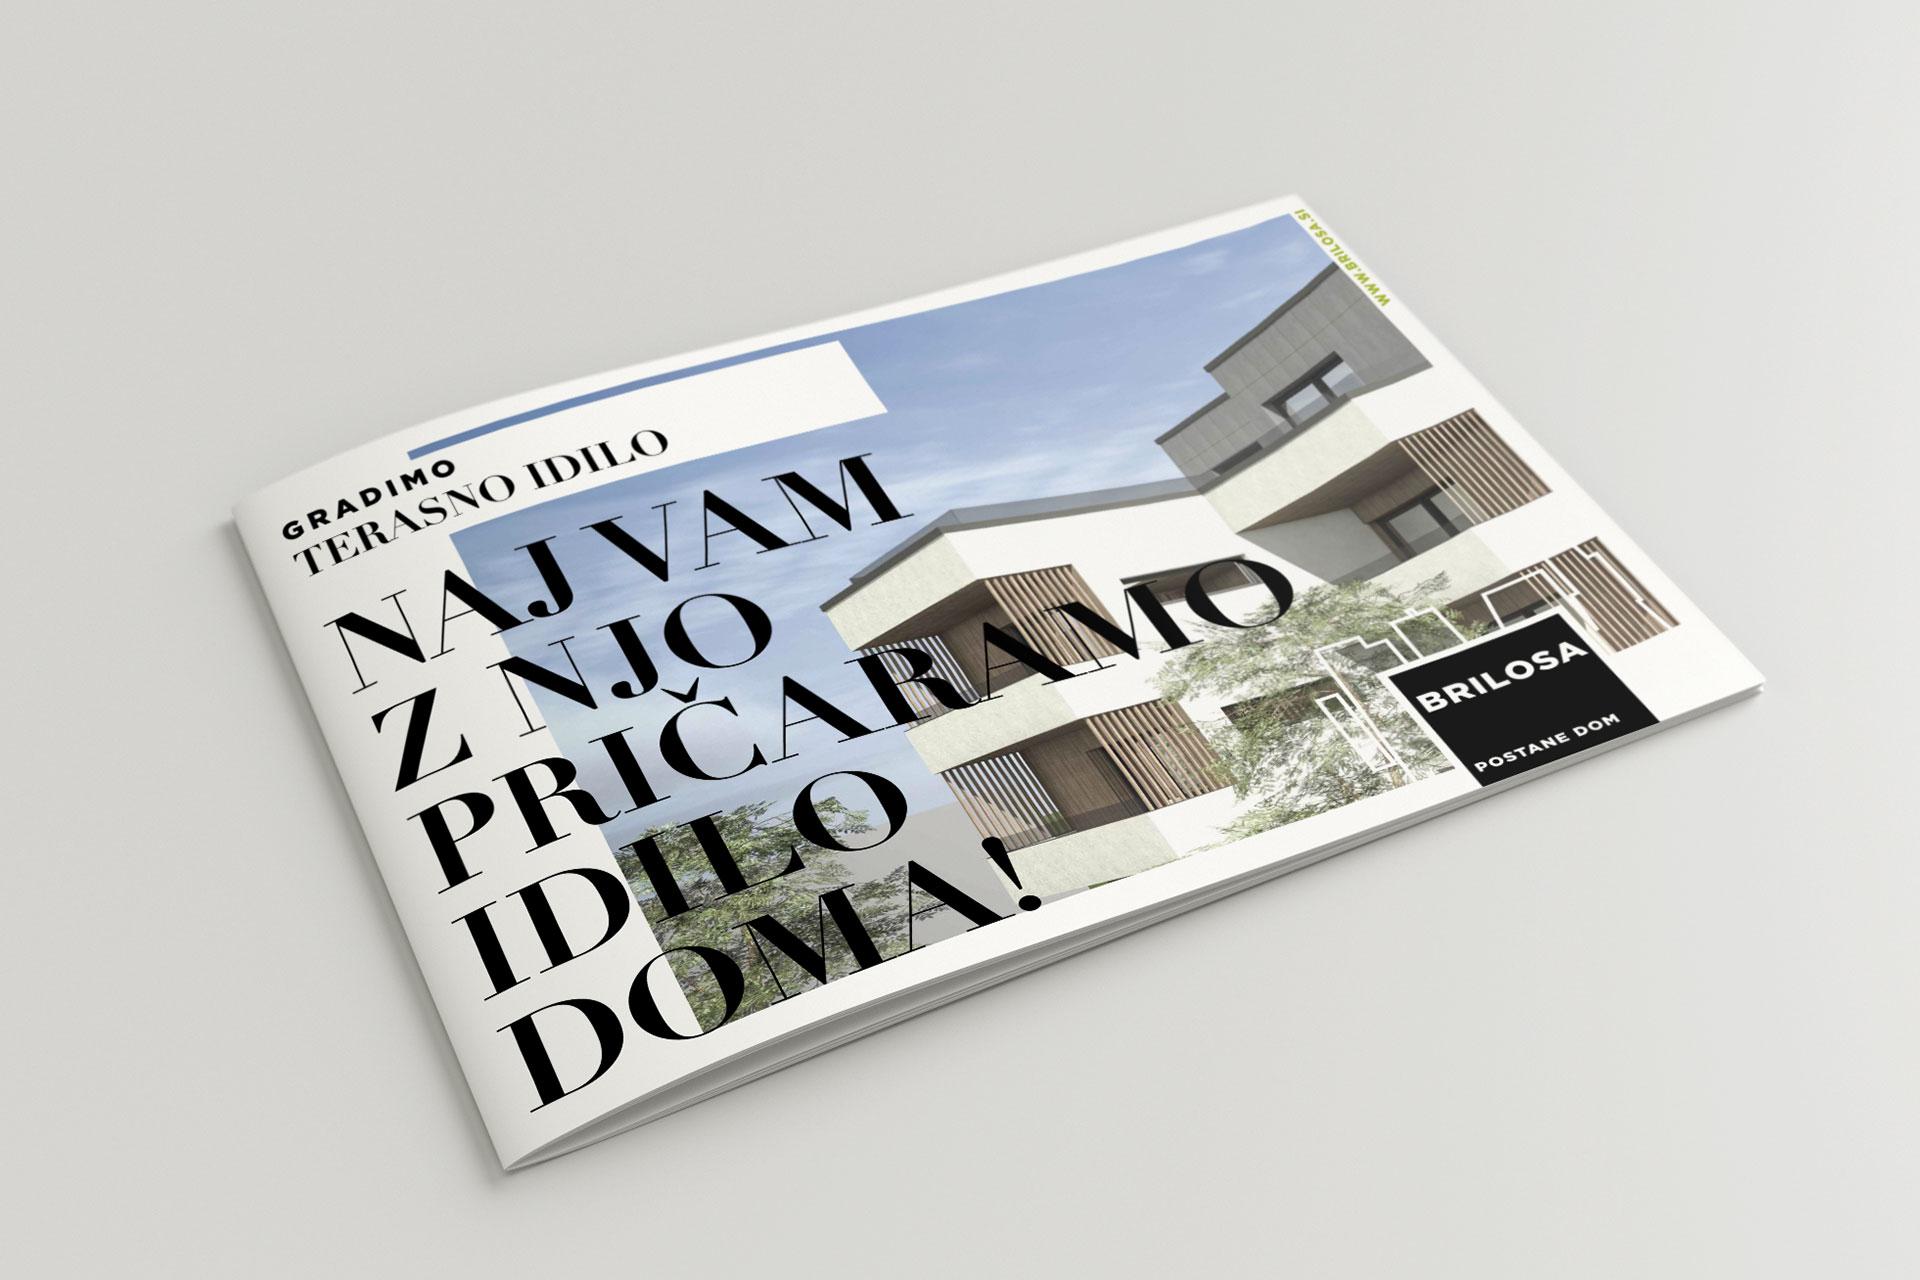 brilosa_marko-marinsek-studio-ma-ma_vizualna_katalog1